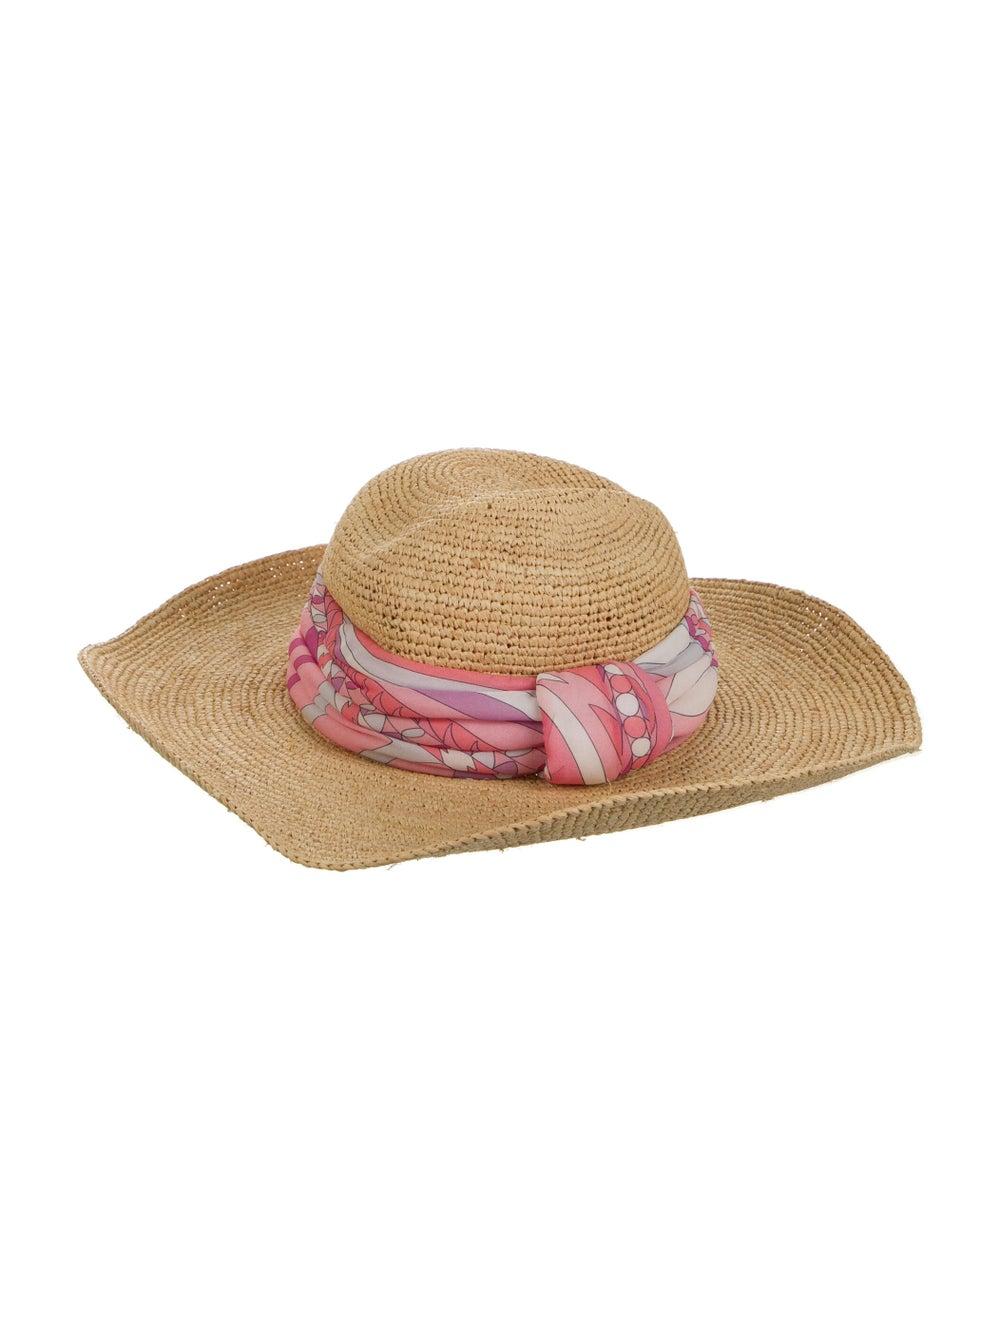 Emilio Pucci Wide Brim Straw Hat Tan - image 2